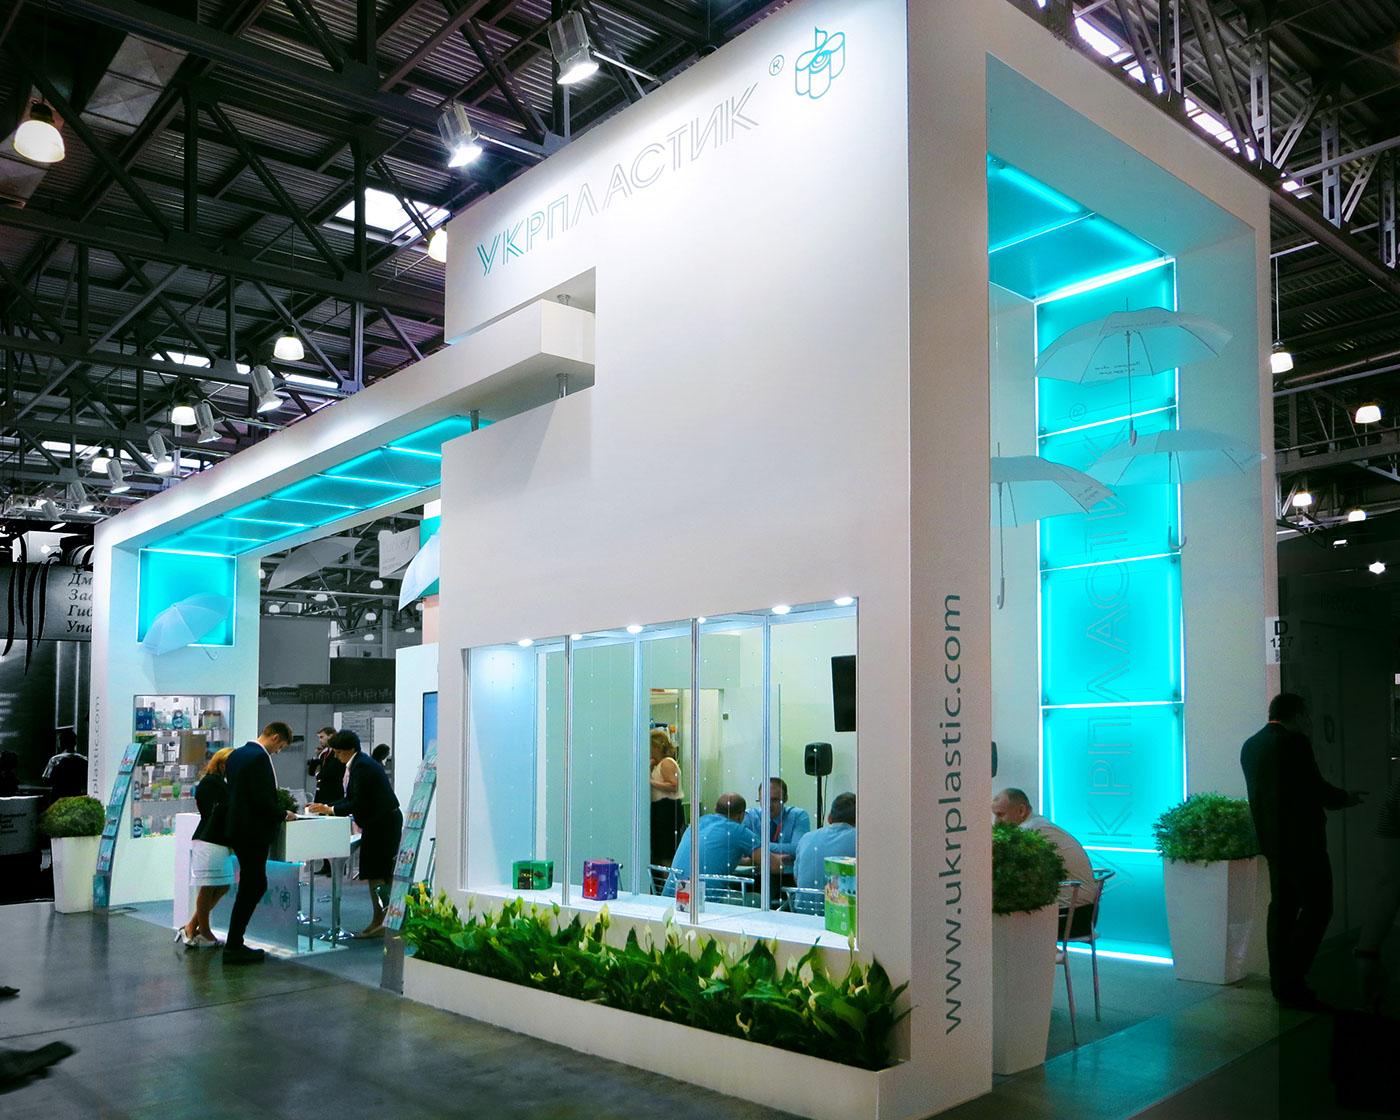 Exhibition Stand Design Gallery : Exhibition stand design on behance